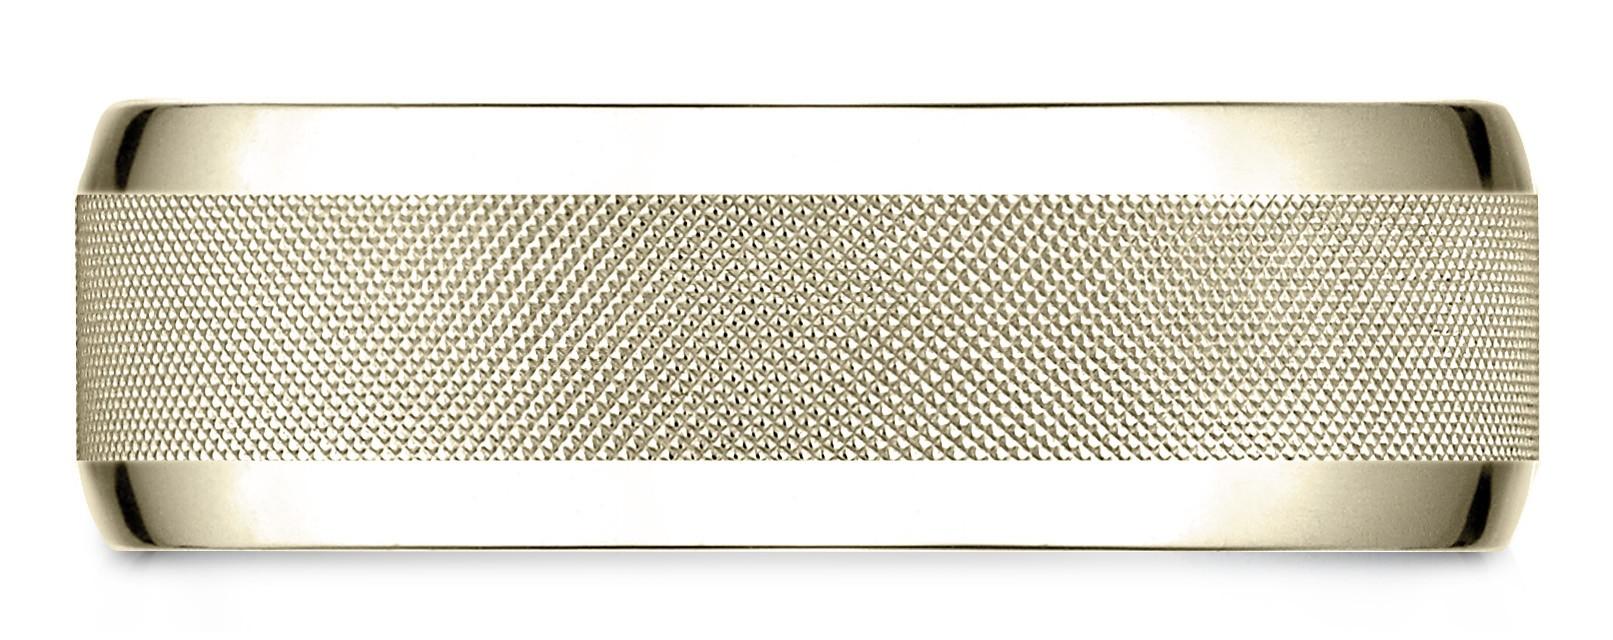 14 Karat Yellow Gold 7mm Comfort-fit High Polish Round Edge Cross Hatch Center Design Band